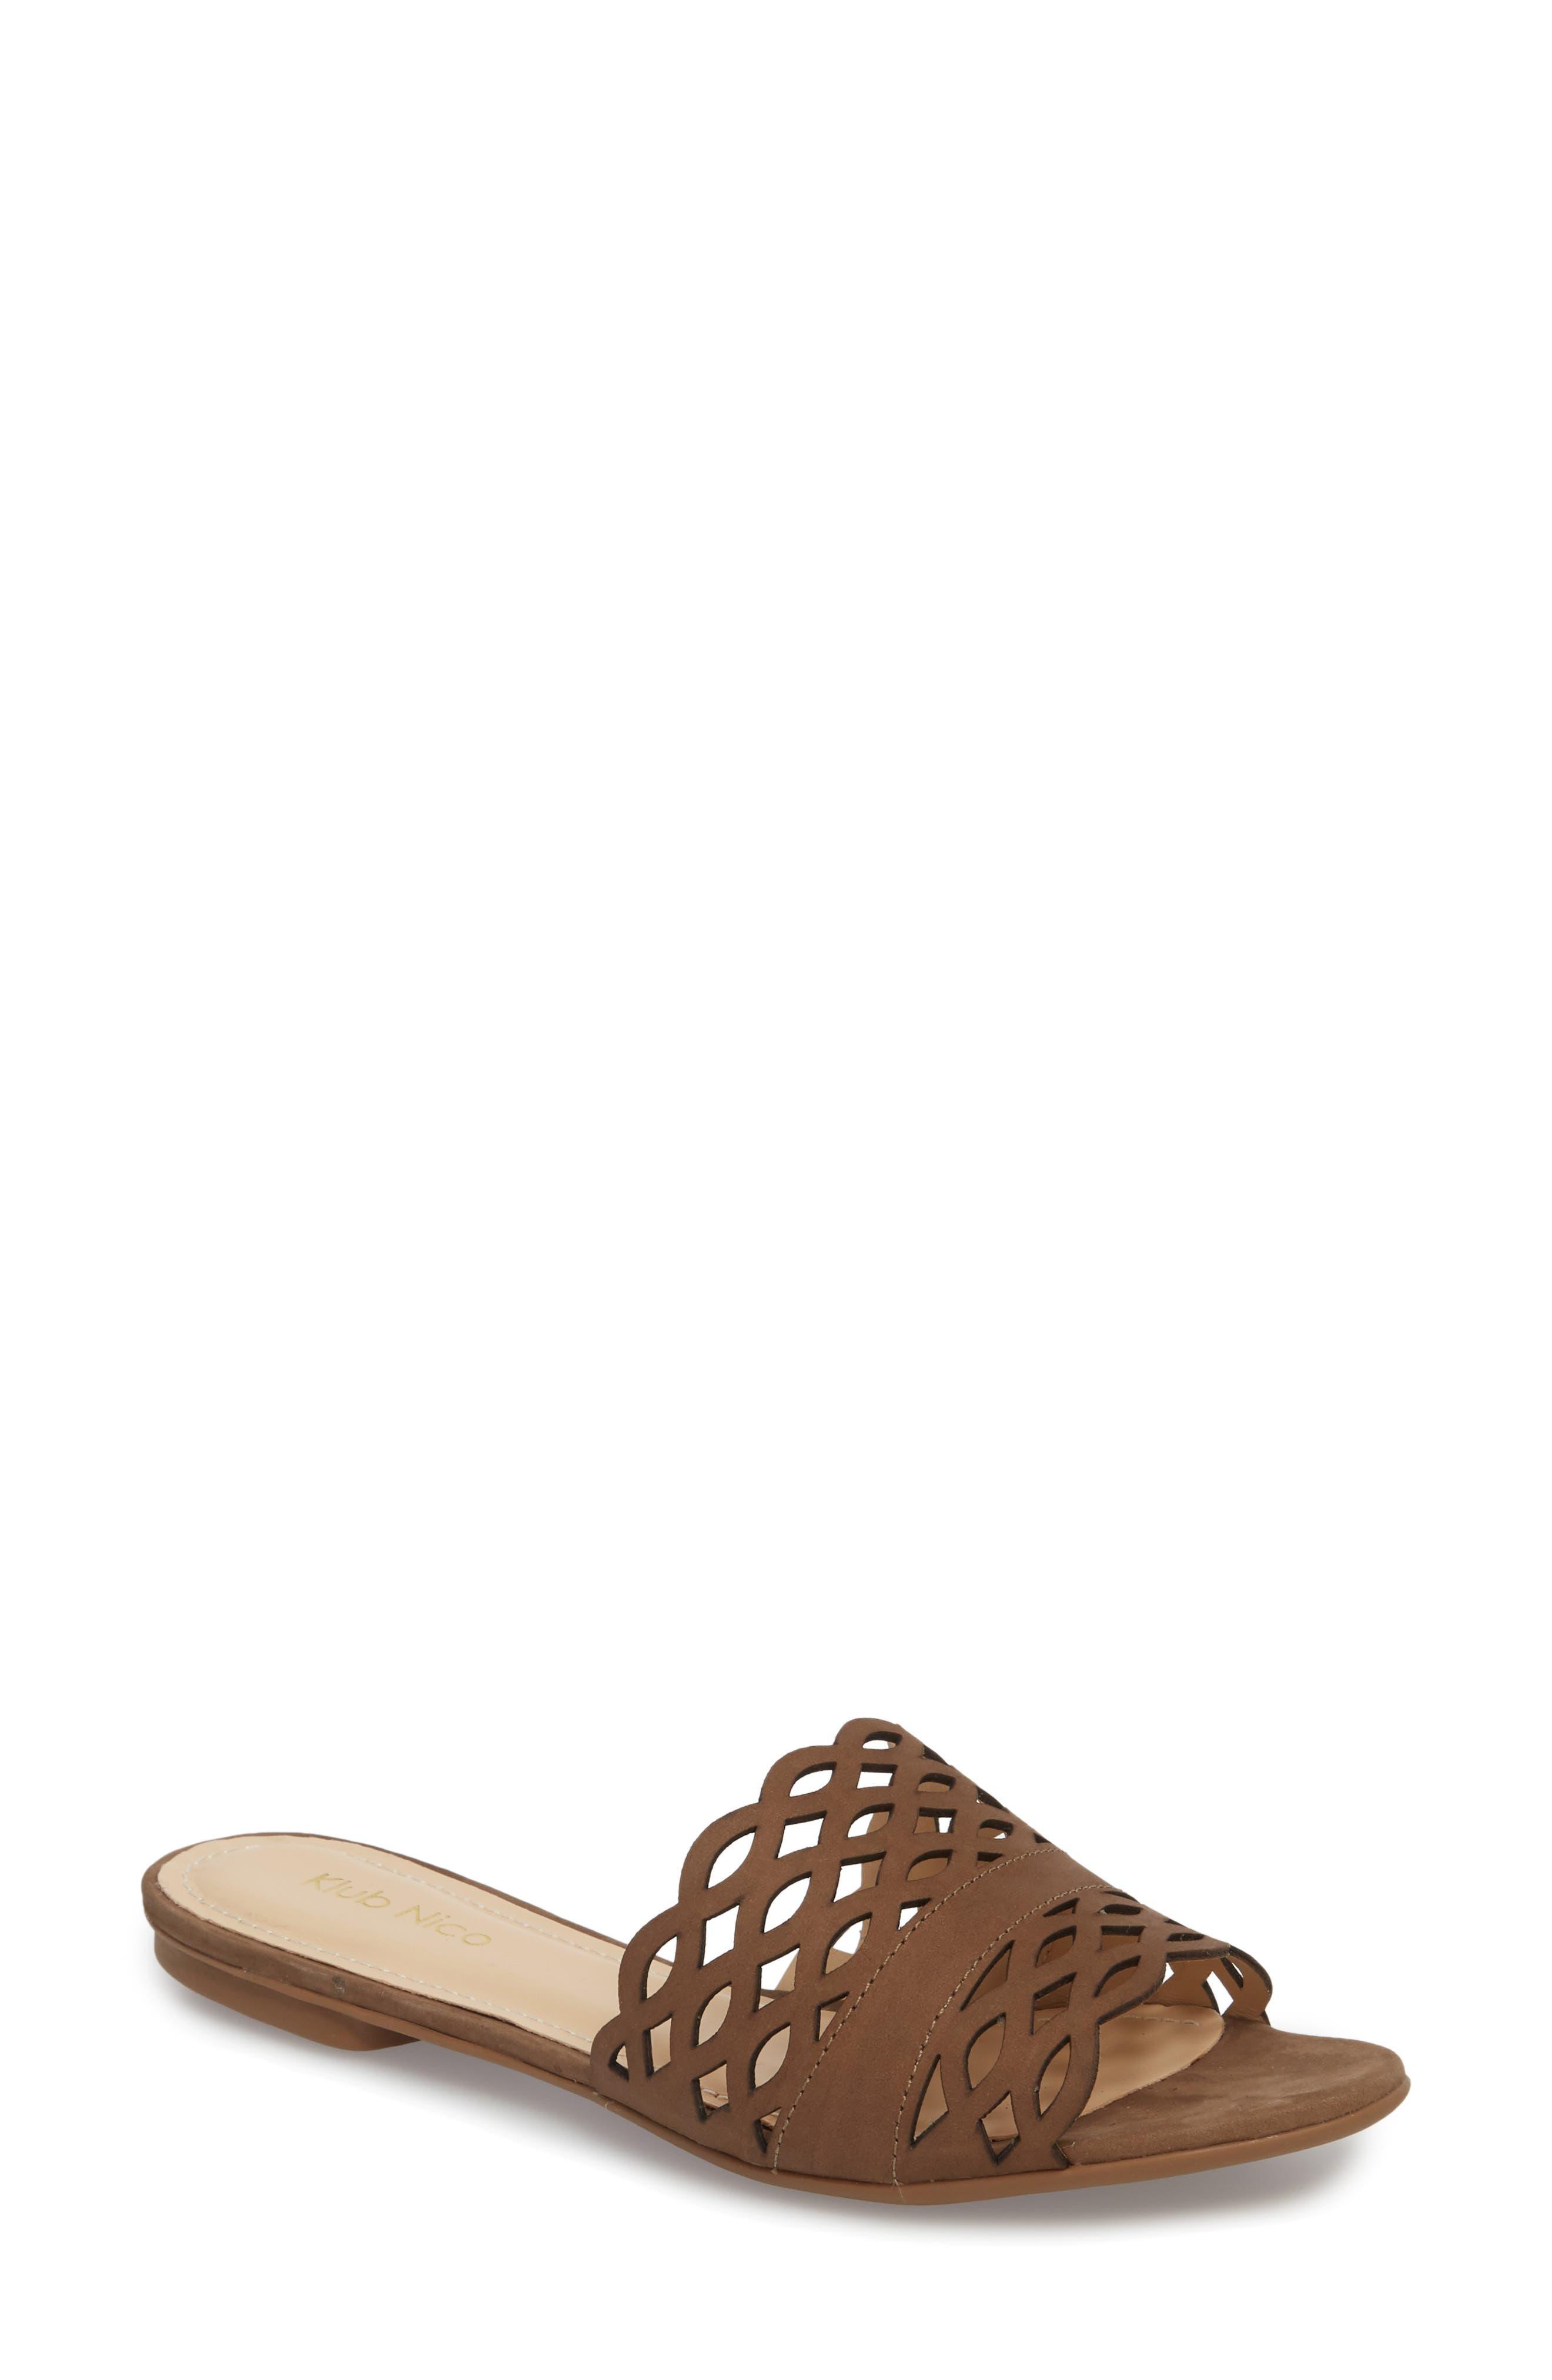 Gynne Slide Sandal,                         Main,                         color, Truffle Leather